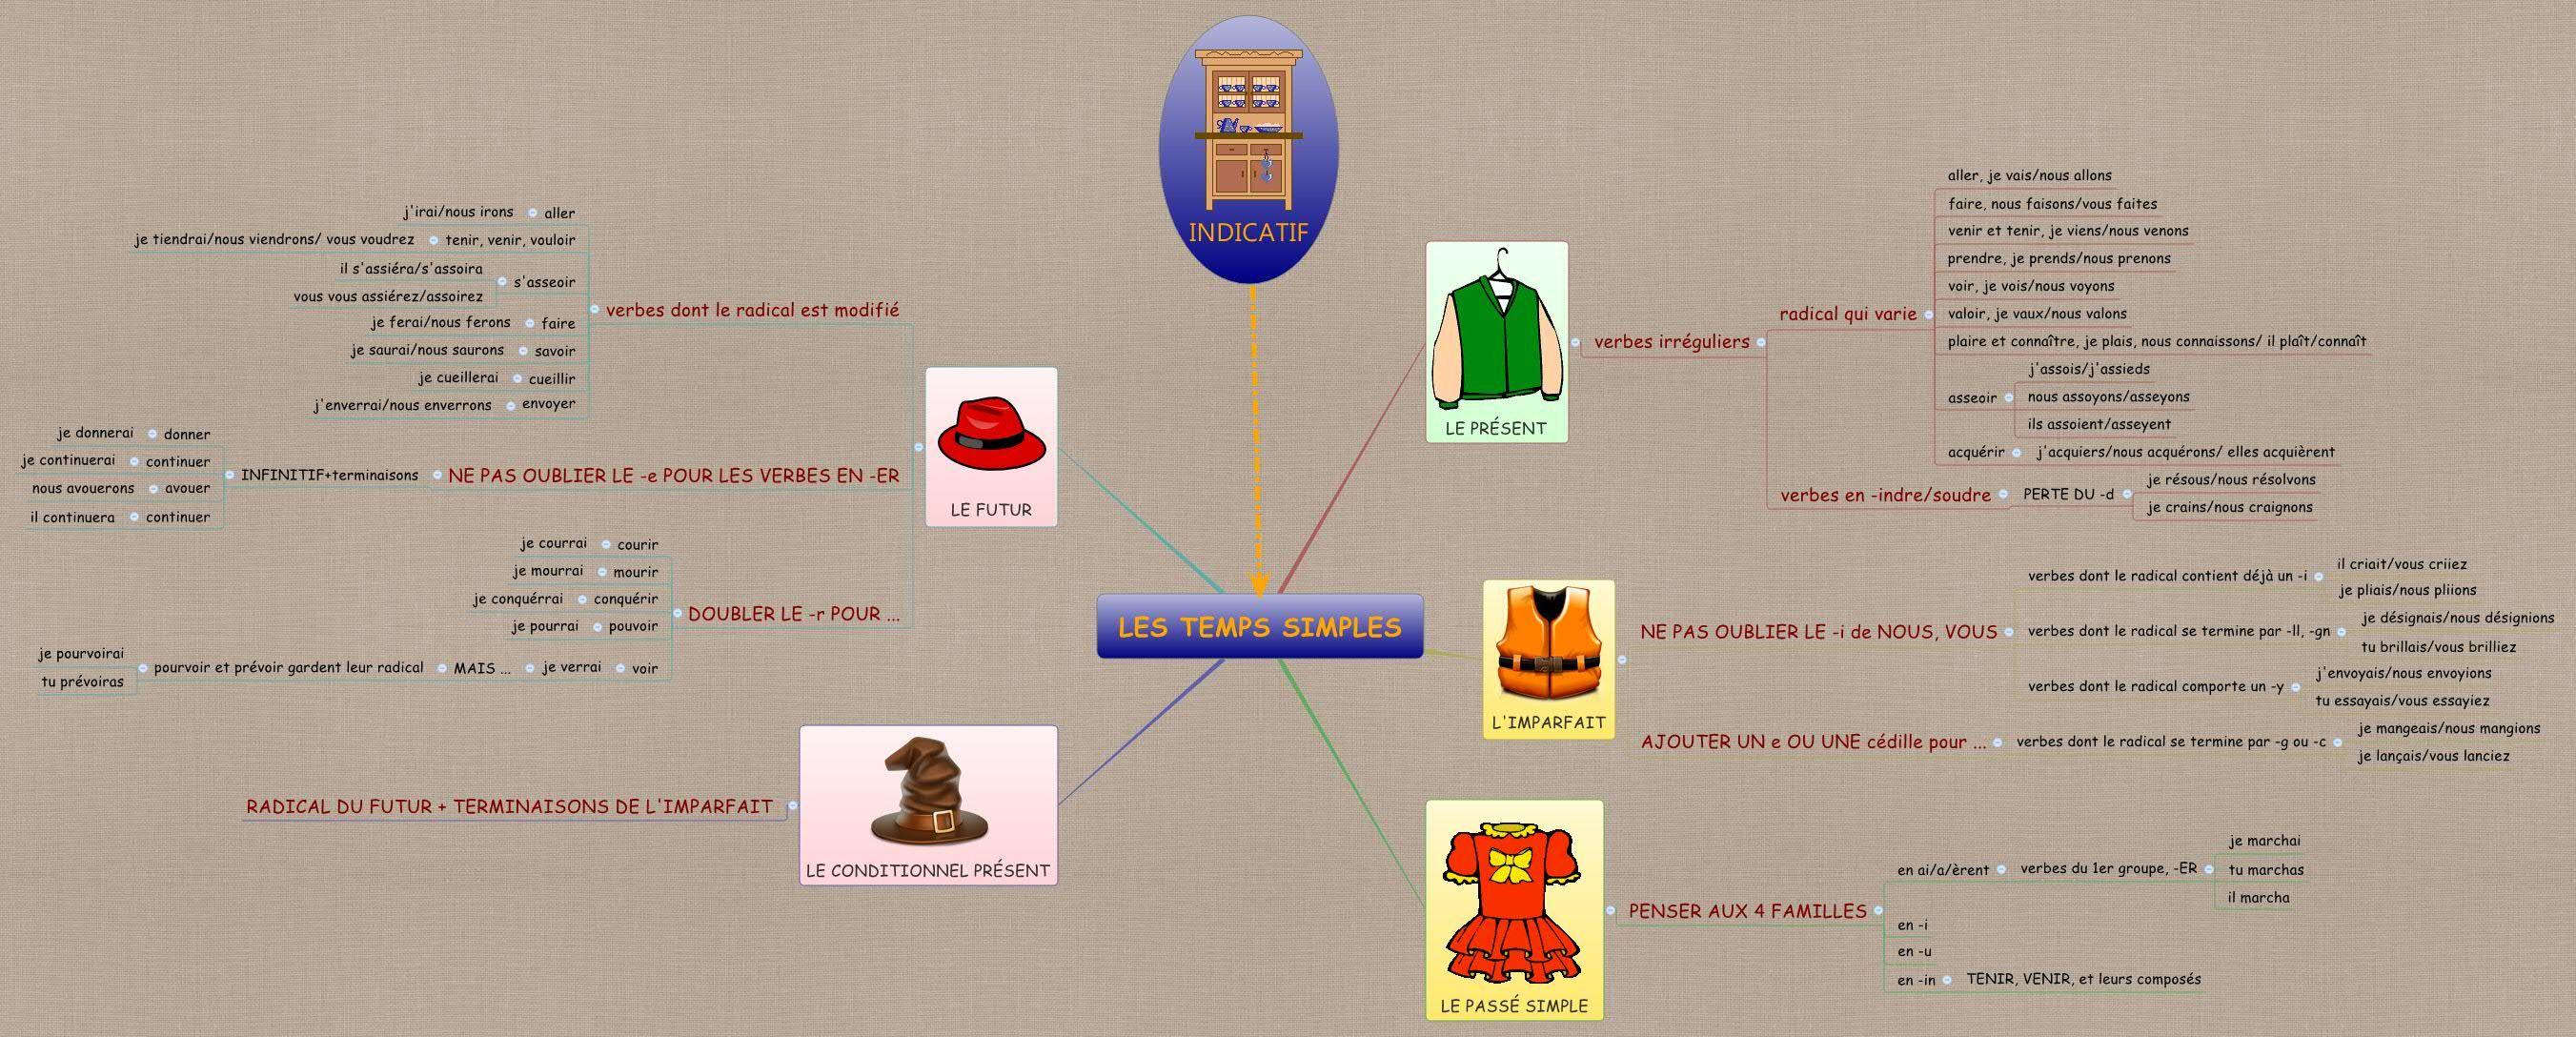 Les Temps Simples De Lindicatif Jpg 2 703 1 088 Pixels Conjugaison Verbe Simple